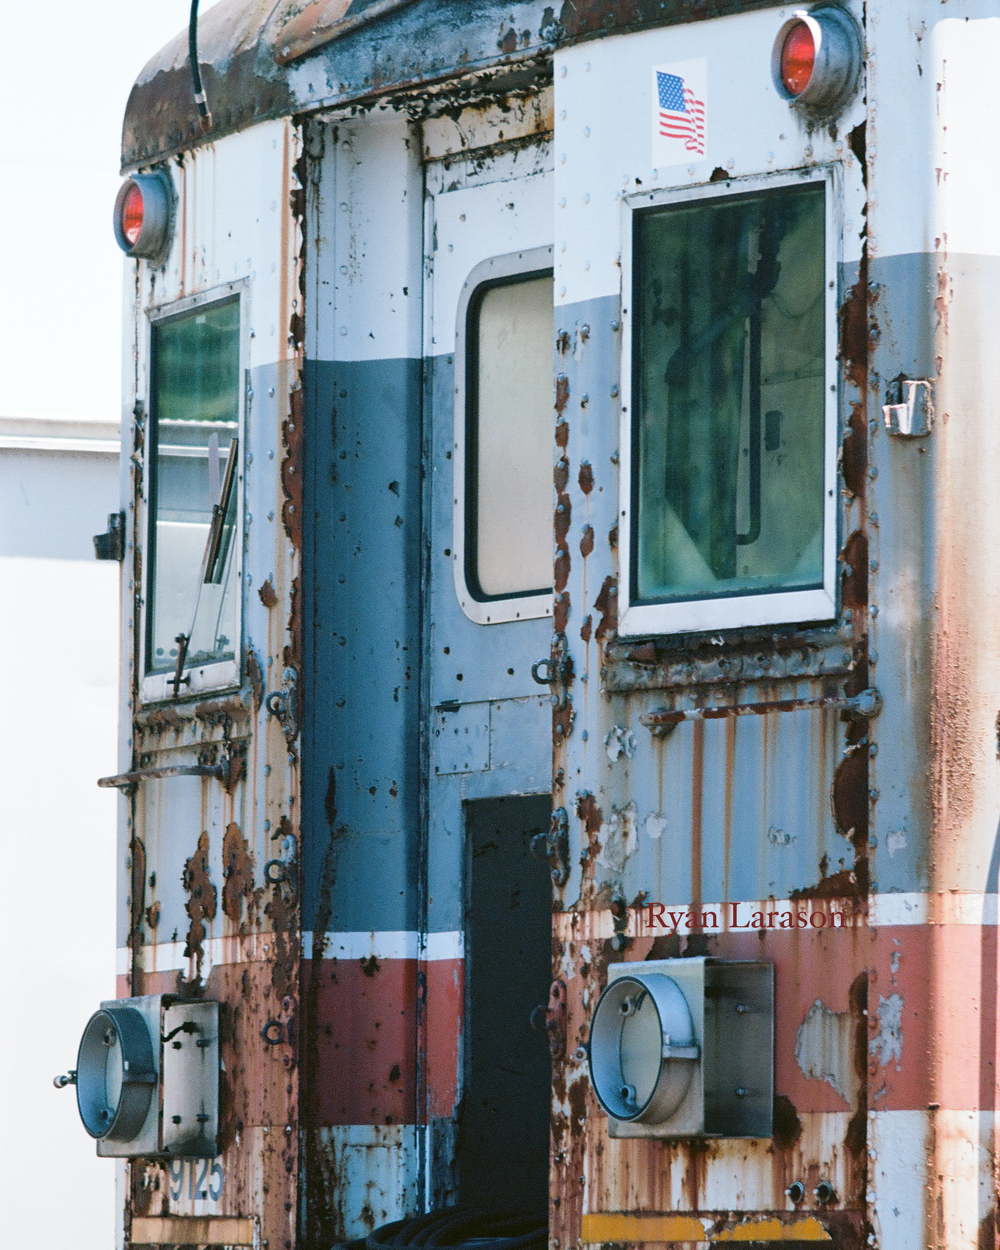 Train_8x10_WM.jpg